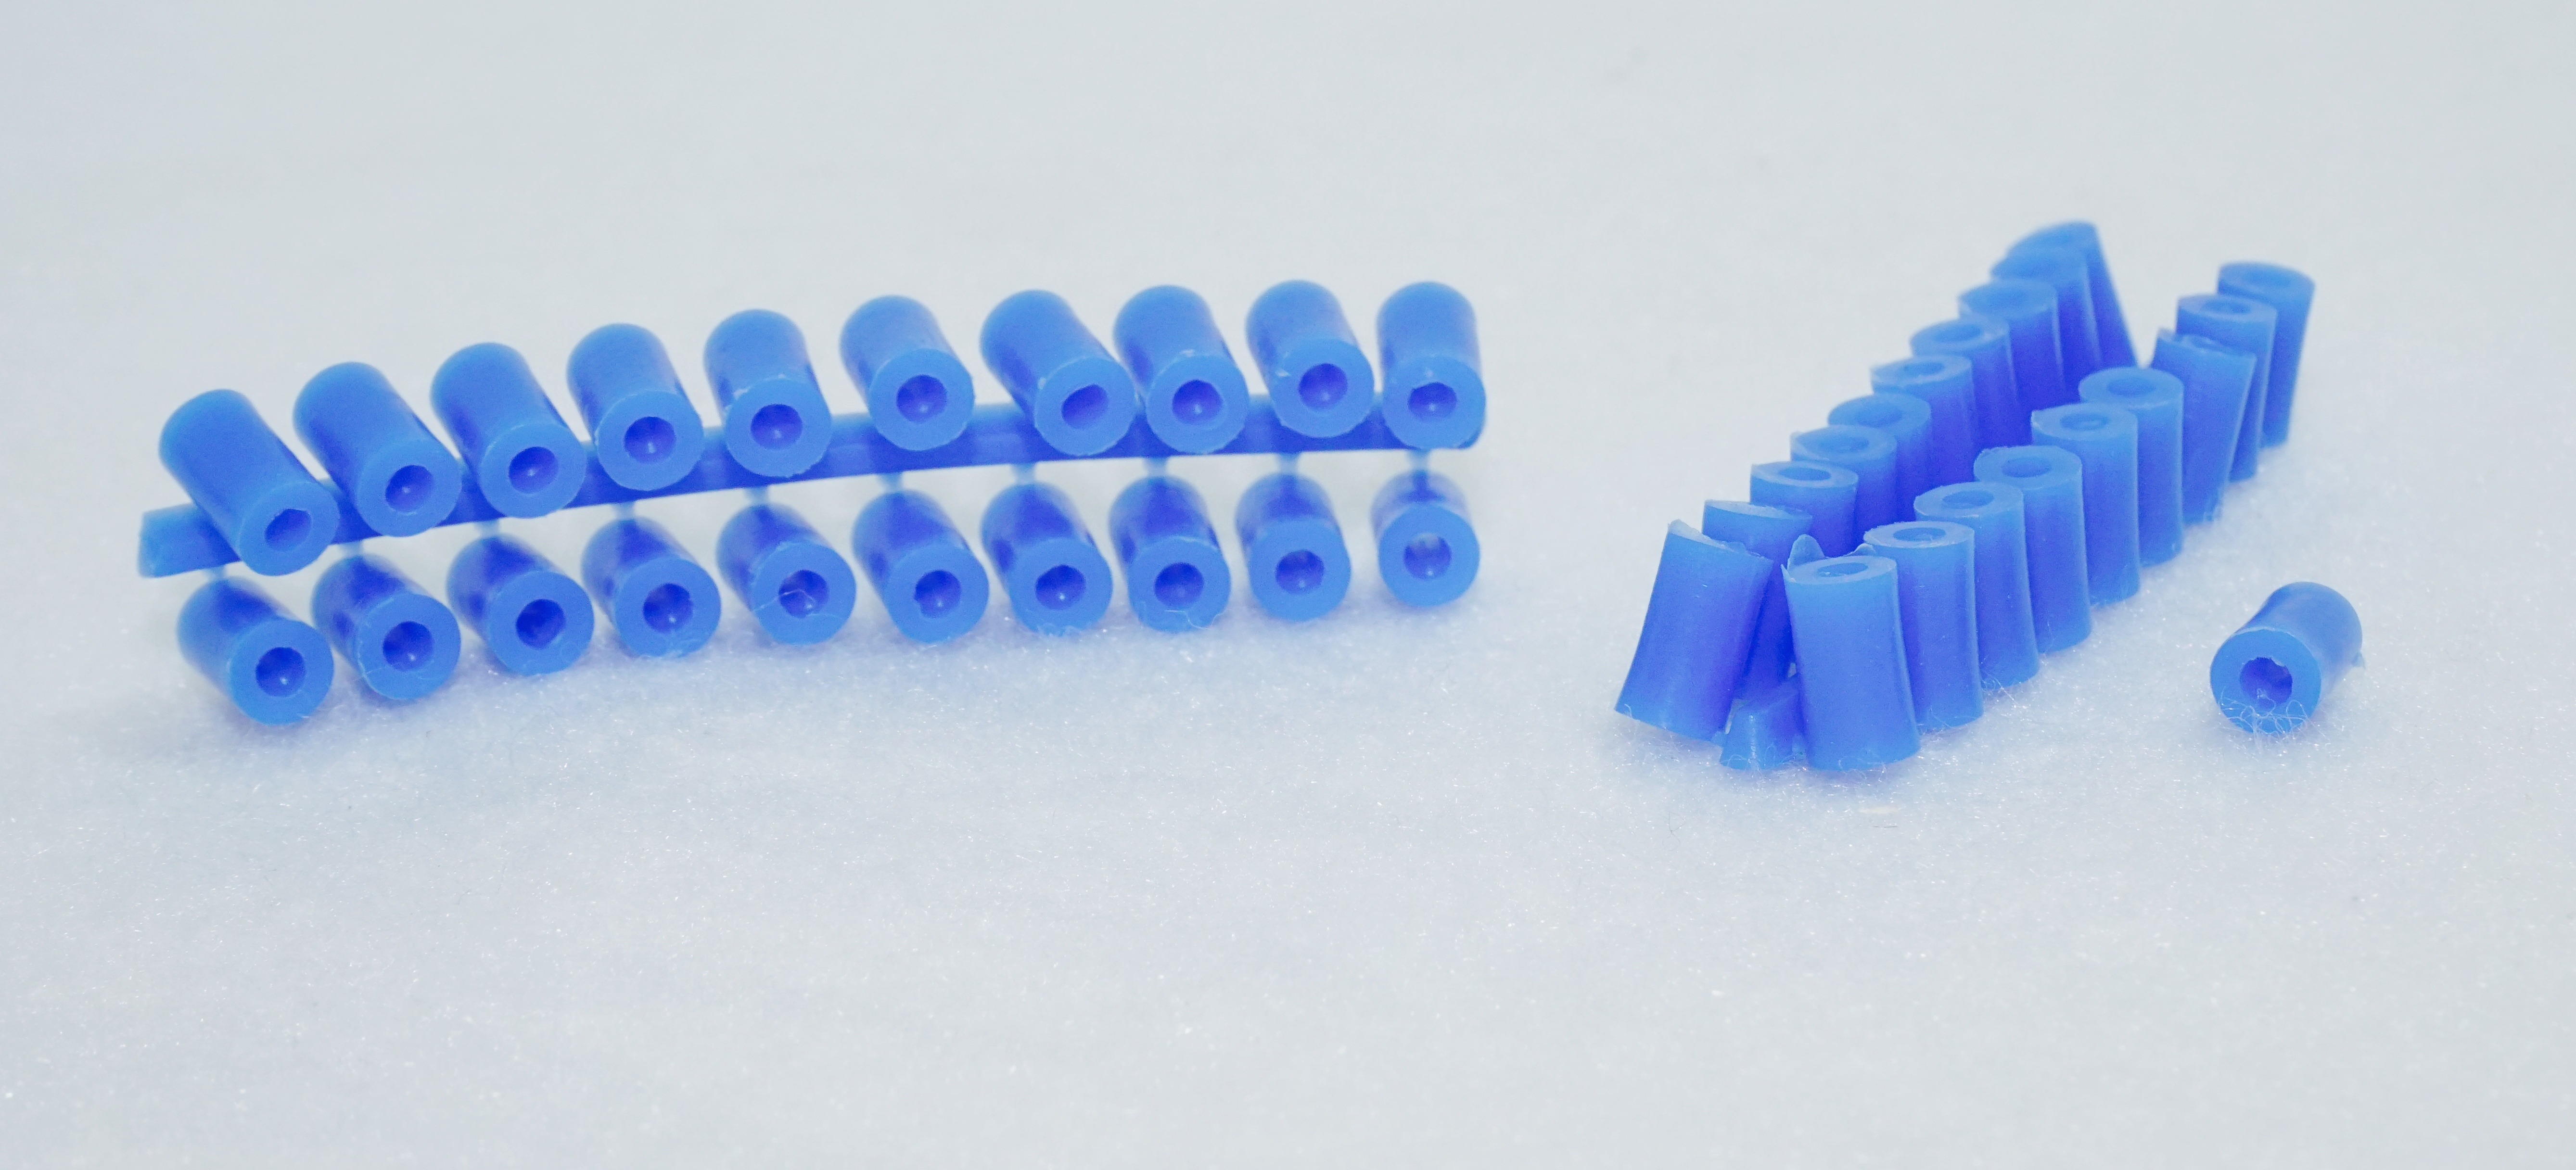 Abstandröllchen aus Plastik